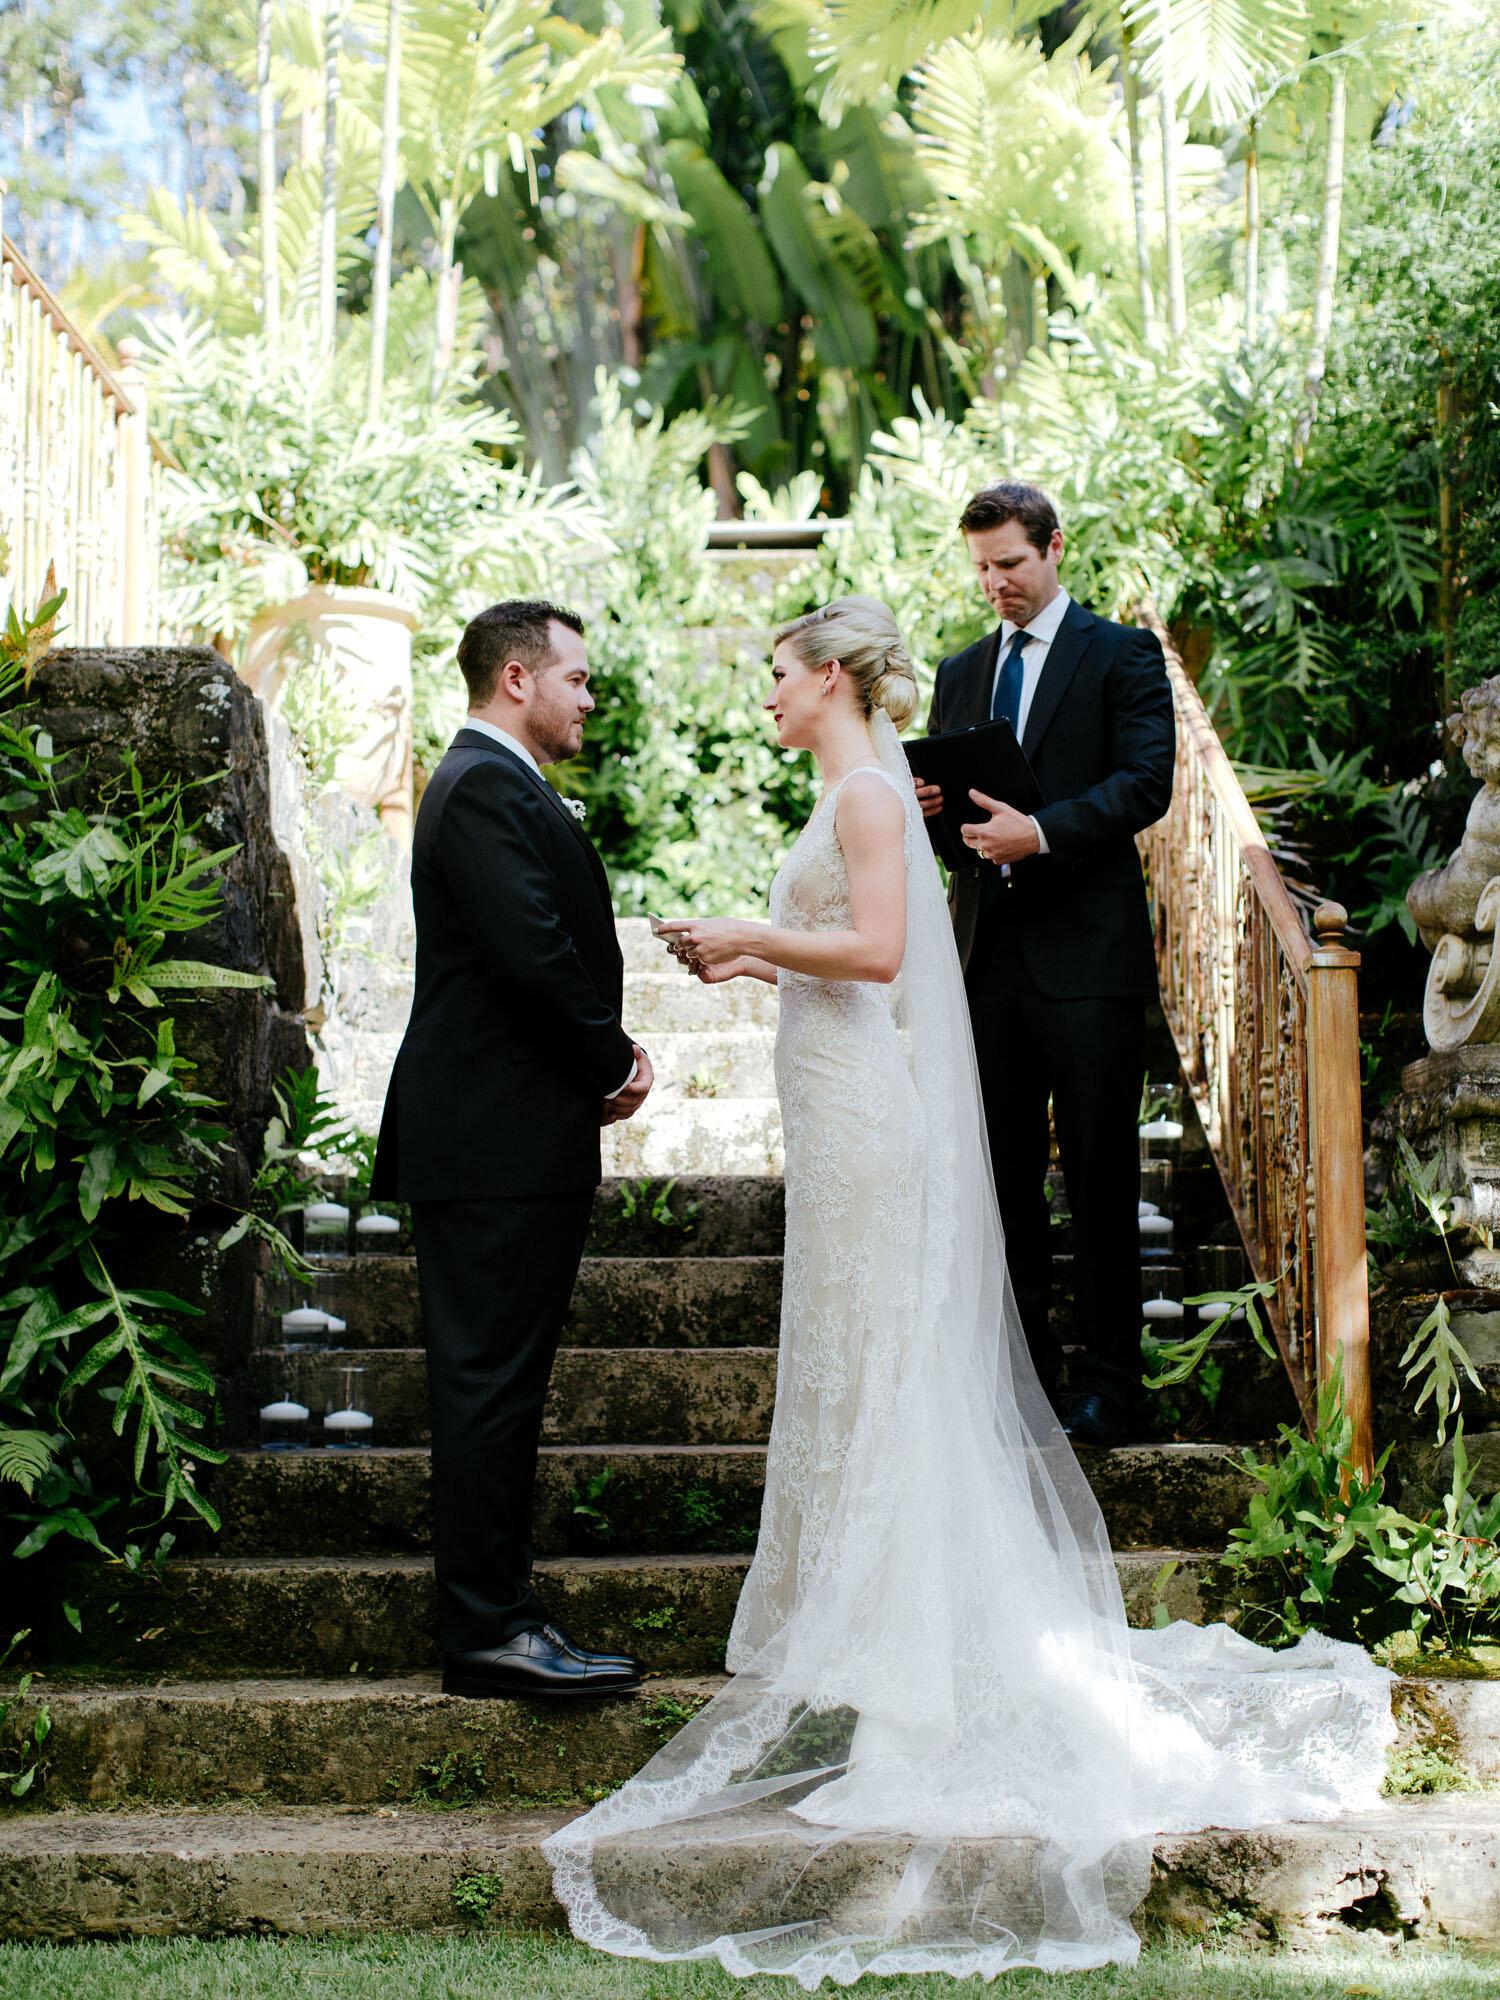 Chris-J-Evans-Maui-Wedding-Kim&Brian2505.jpg